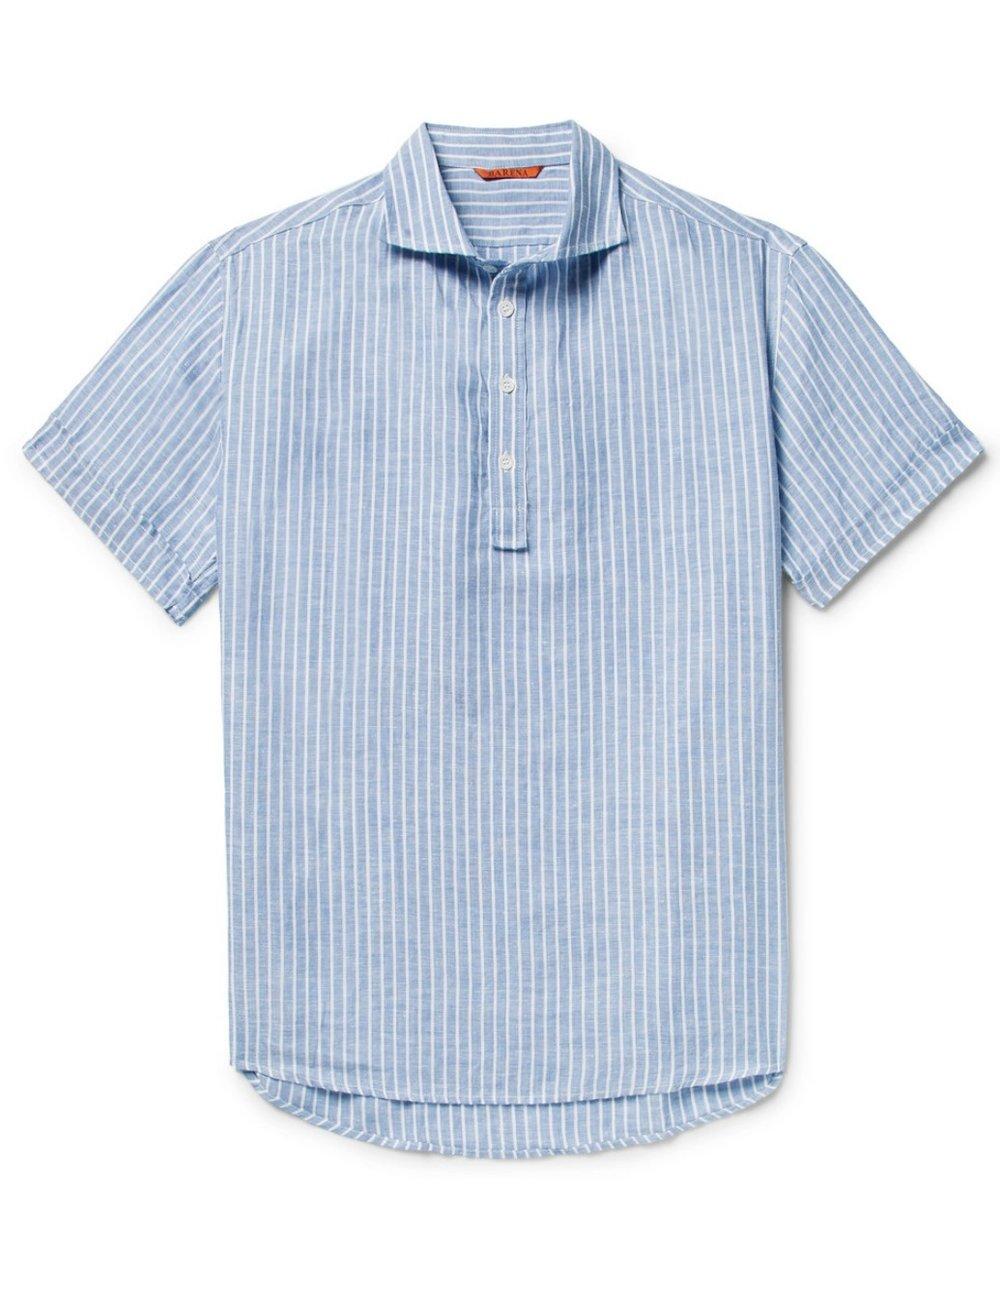 BARENAStriped linen polo shirt - MRPORTER.COM